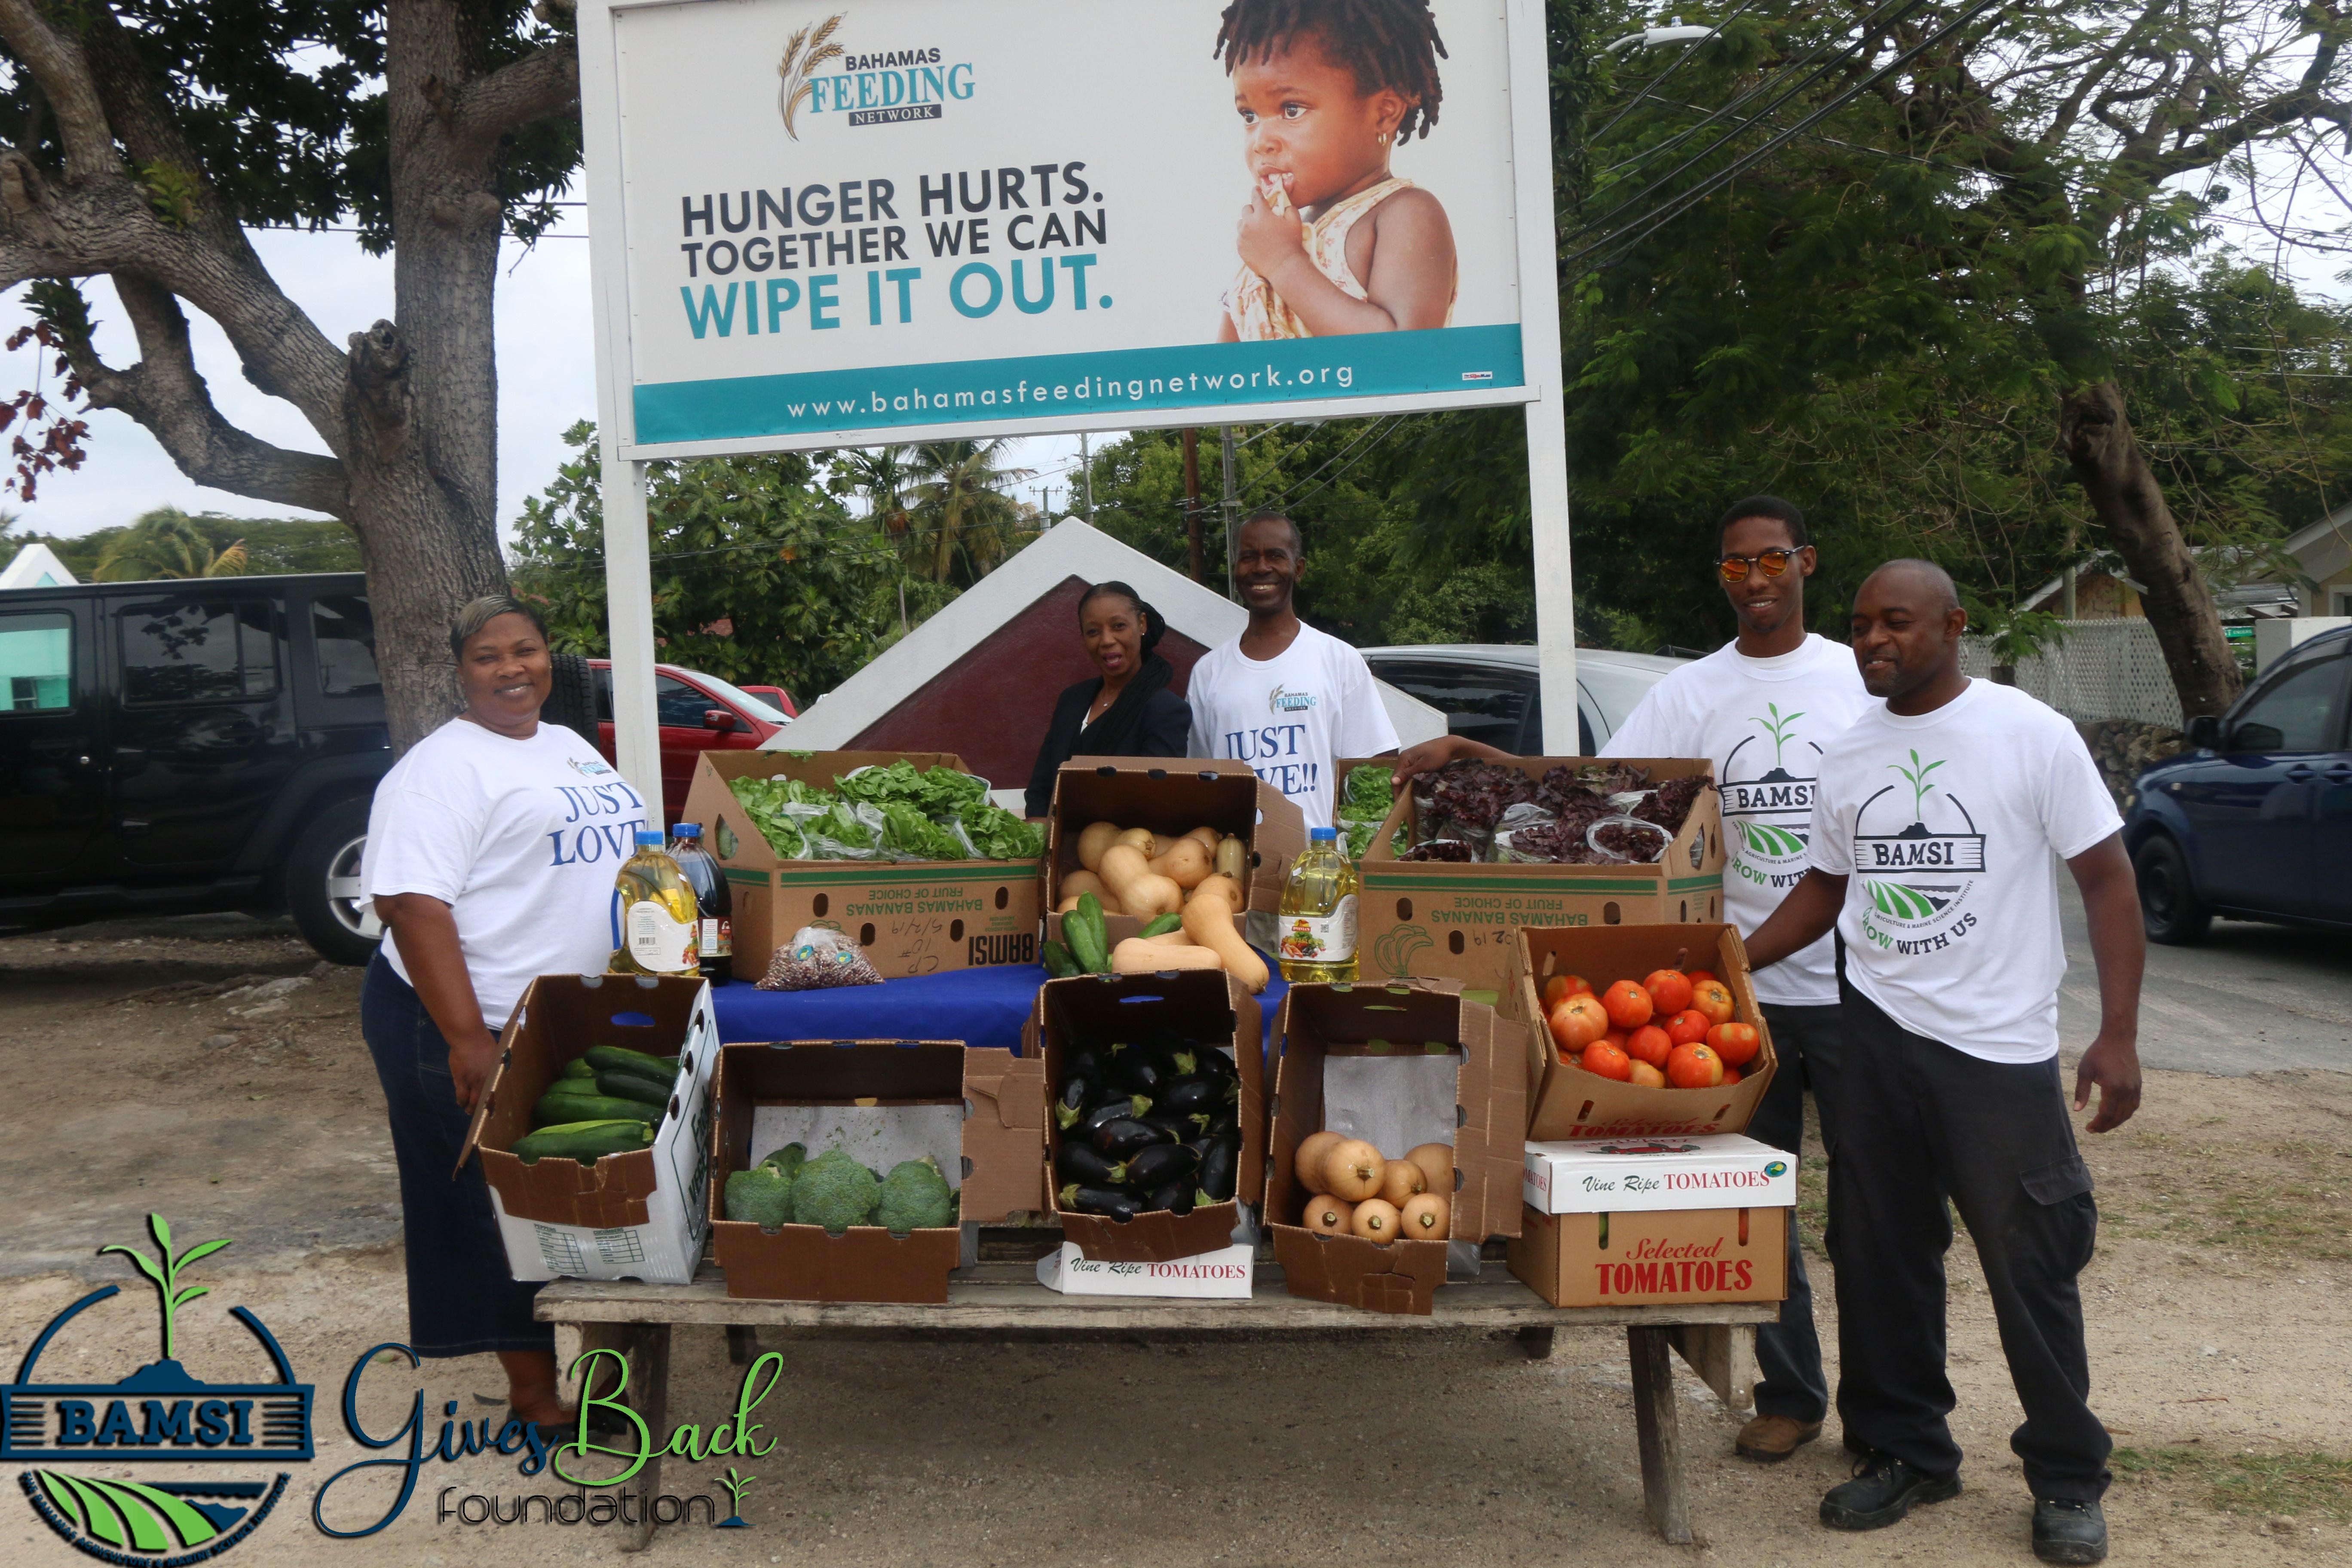 BAMSI joins frontline in fight against hunger